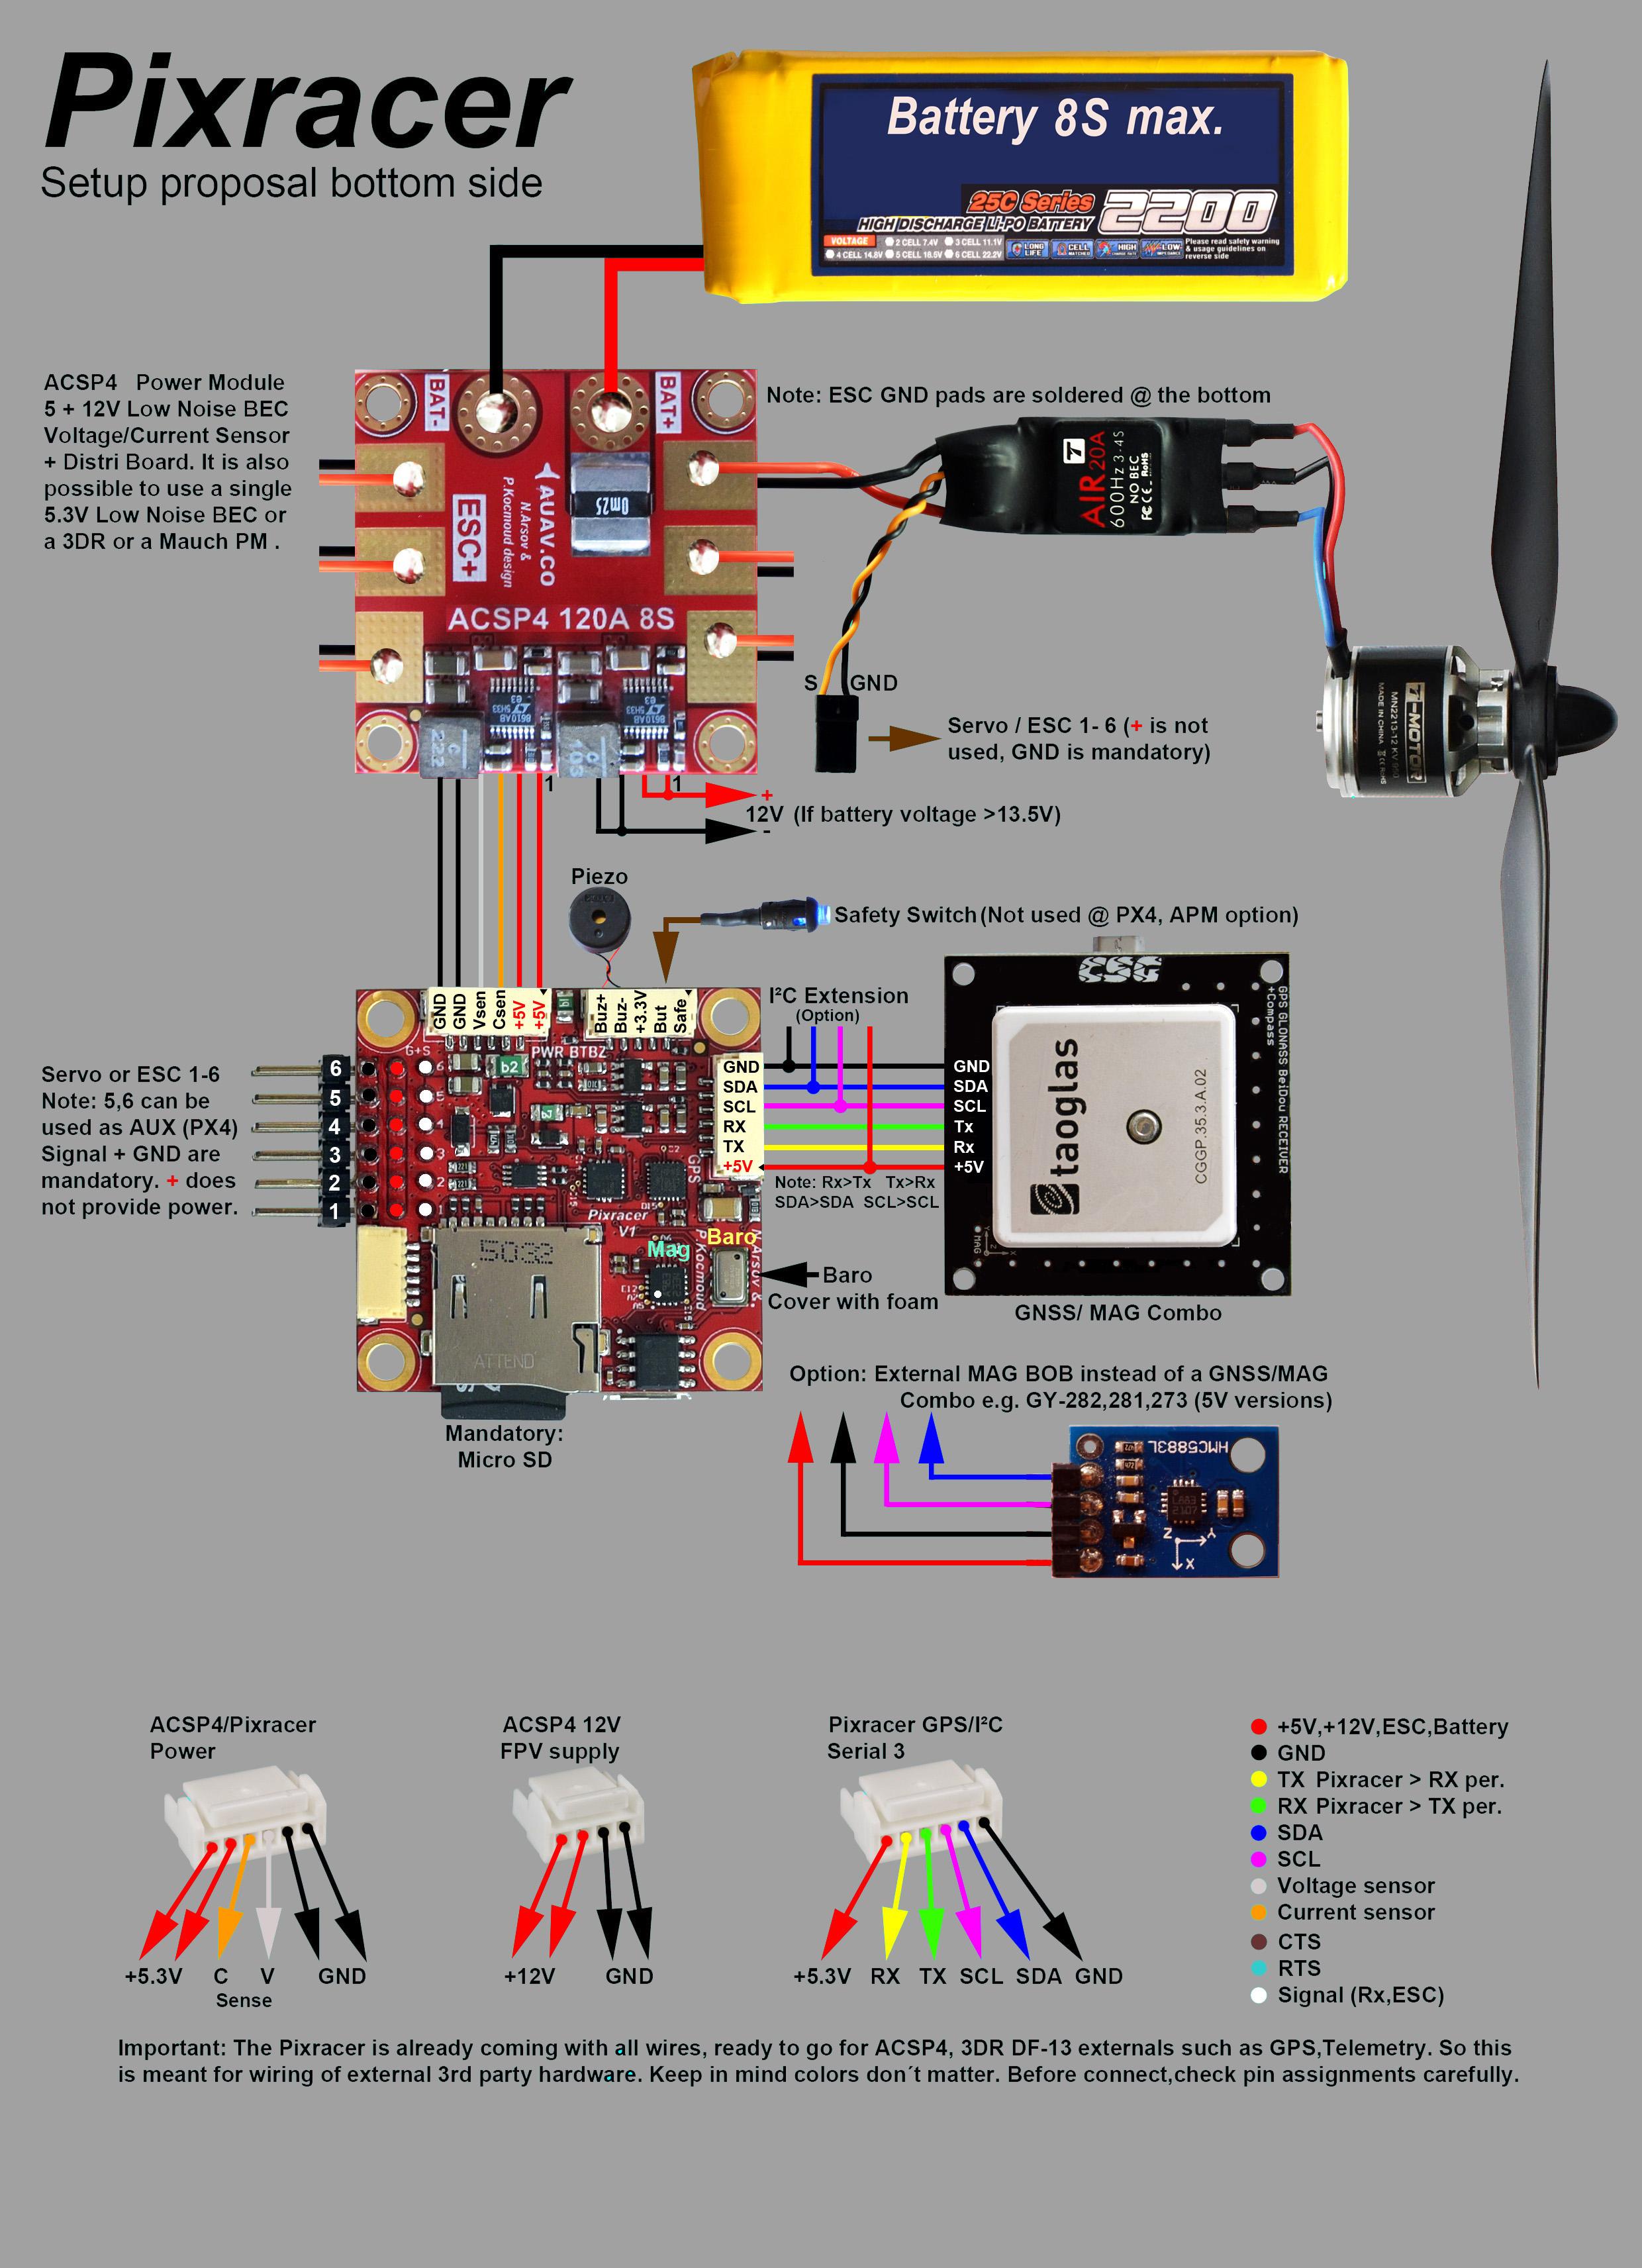 Mini PX4 Pixracer V1 0 Flight Controller Autopilot with WiFi